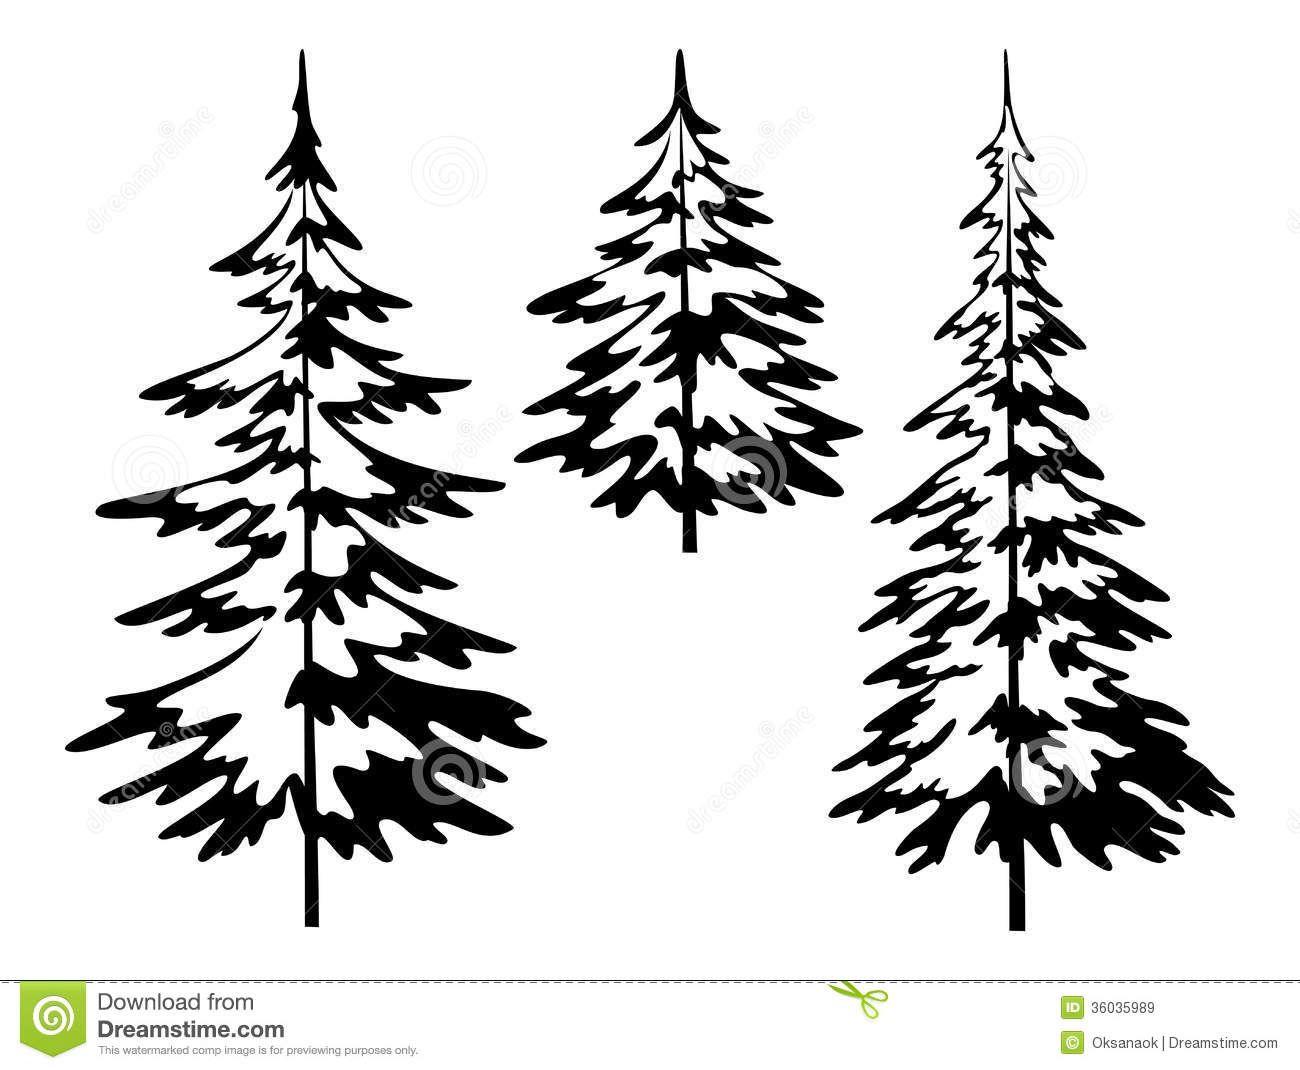 47+ Pine tree clipart black ideas in 2021